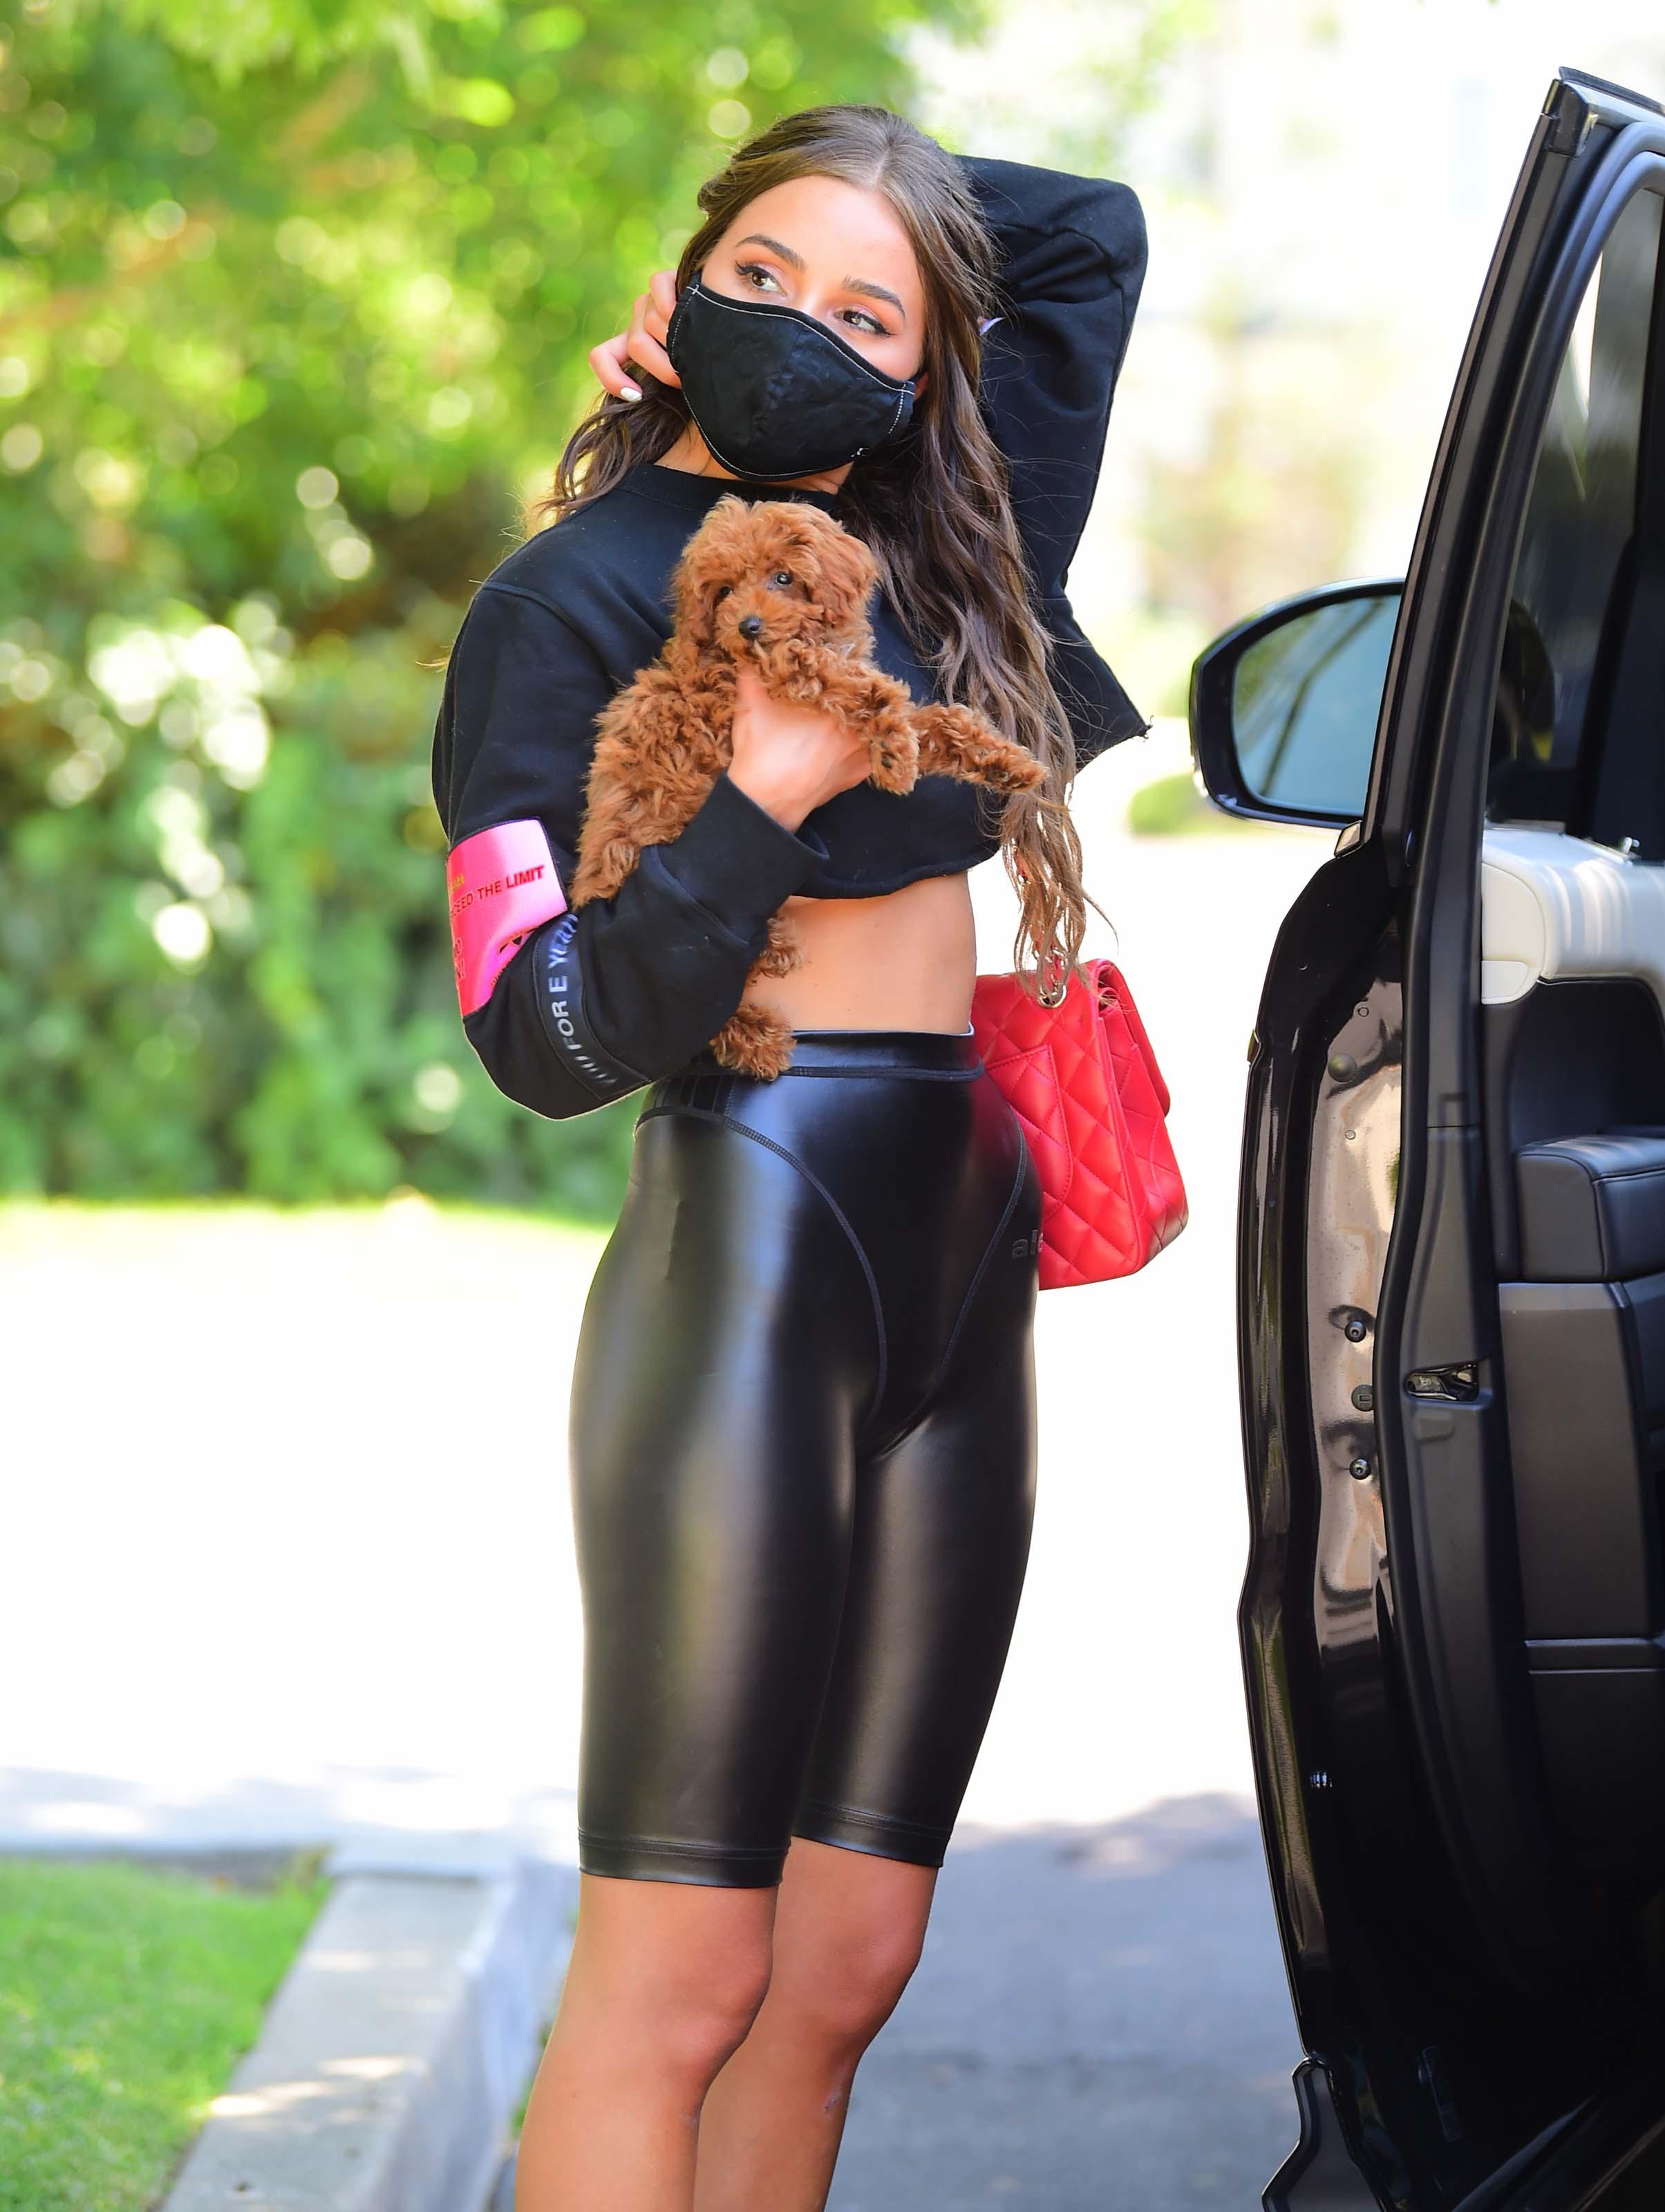 Olivia Culpo looks fantastic as she visits a friend's house